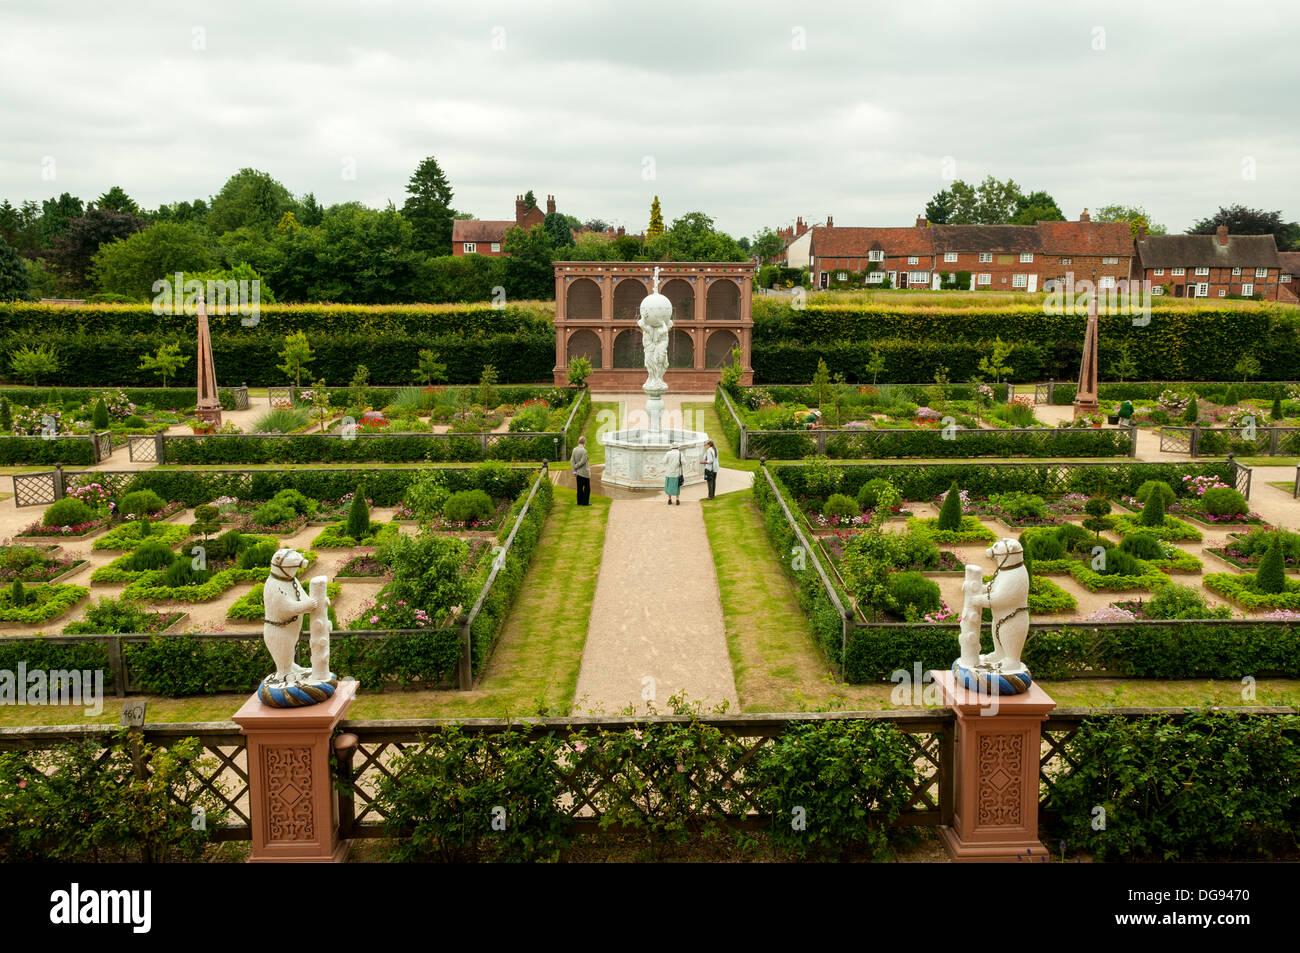 Elizabethan Gardens, Kenilworth Castle, Kenilworth, Warwickshire, England - Stock Image